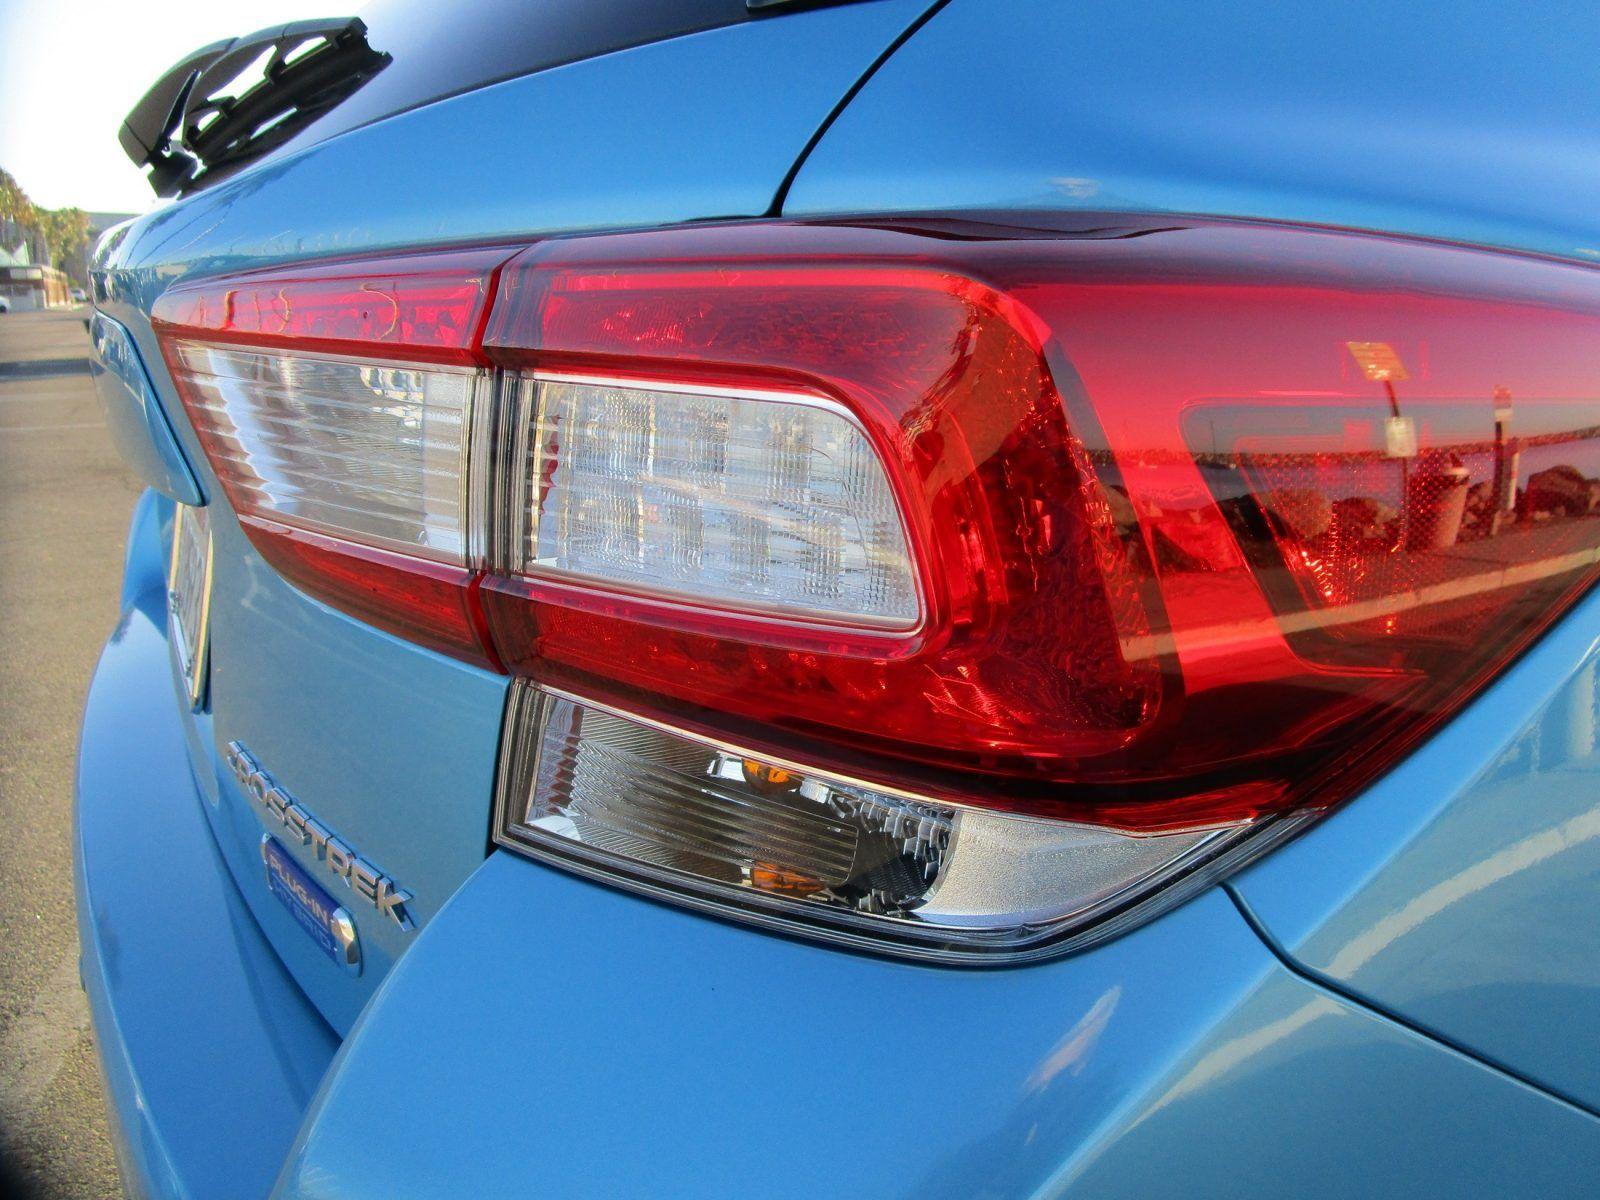 2019 Subaru Crosstrek Plug In Hybrid 10 In 2020 Subaru Crosstrek Subaru Latest Cars